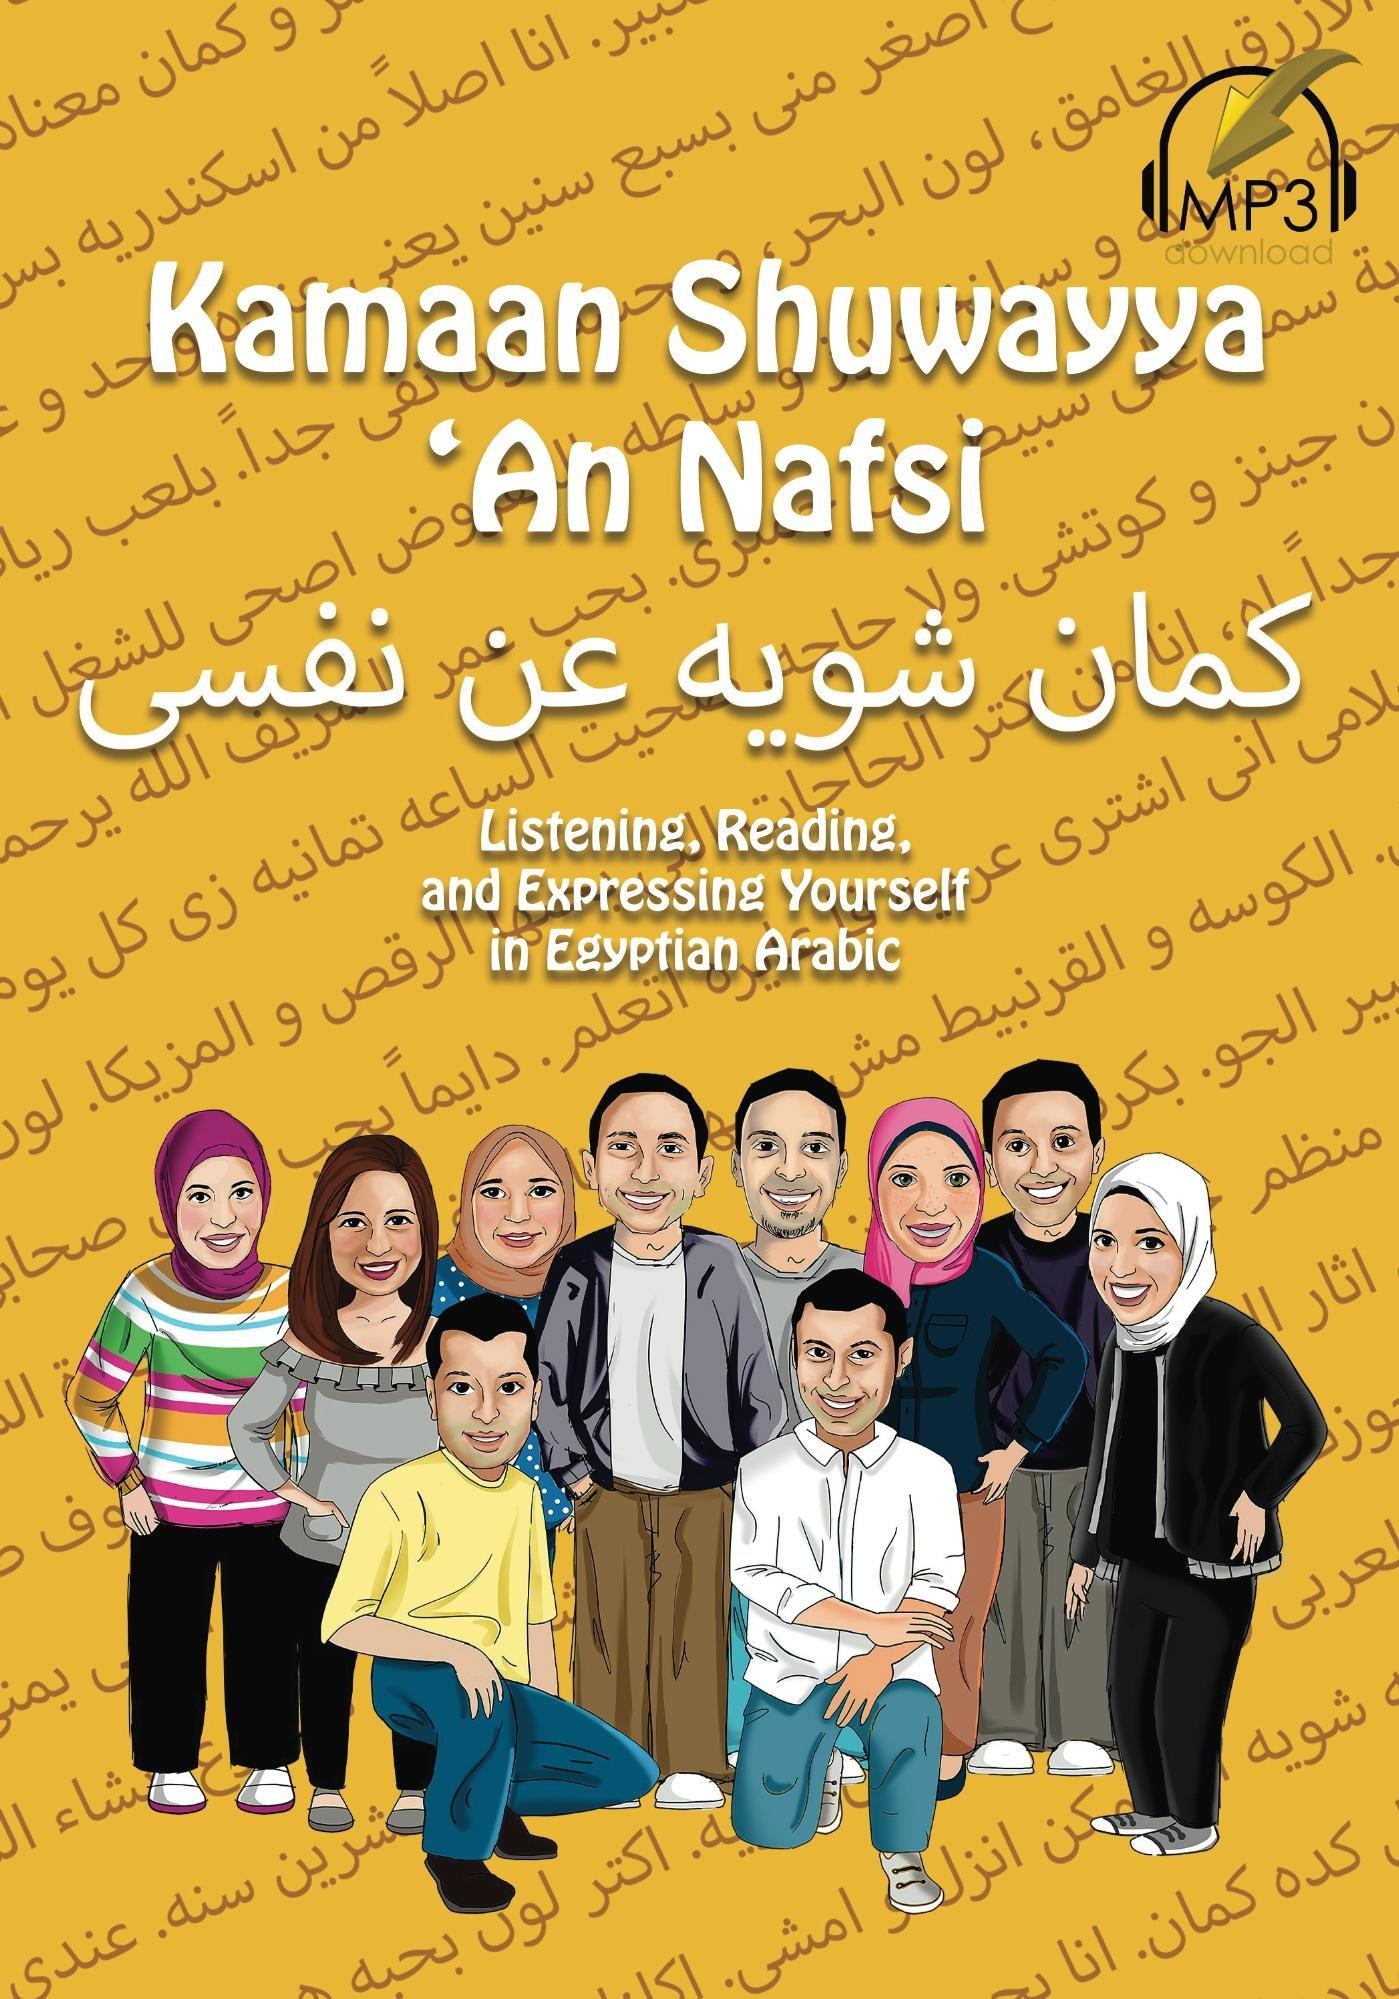 Kamaan Shuwayya 'An Nafsi  Listening Reading And Expressing Yourself In Egyptian Arabic  Shuwayya 'An Nafsi Series Book 2   English Edition